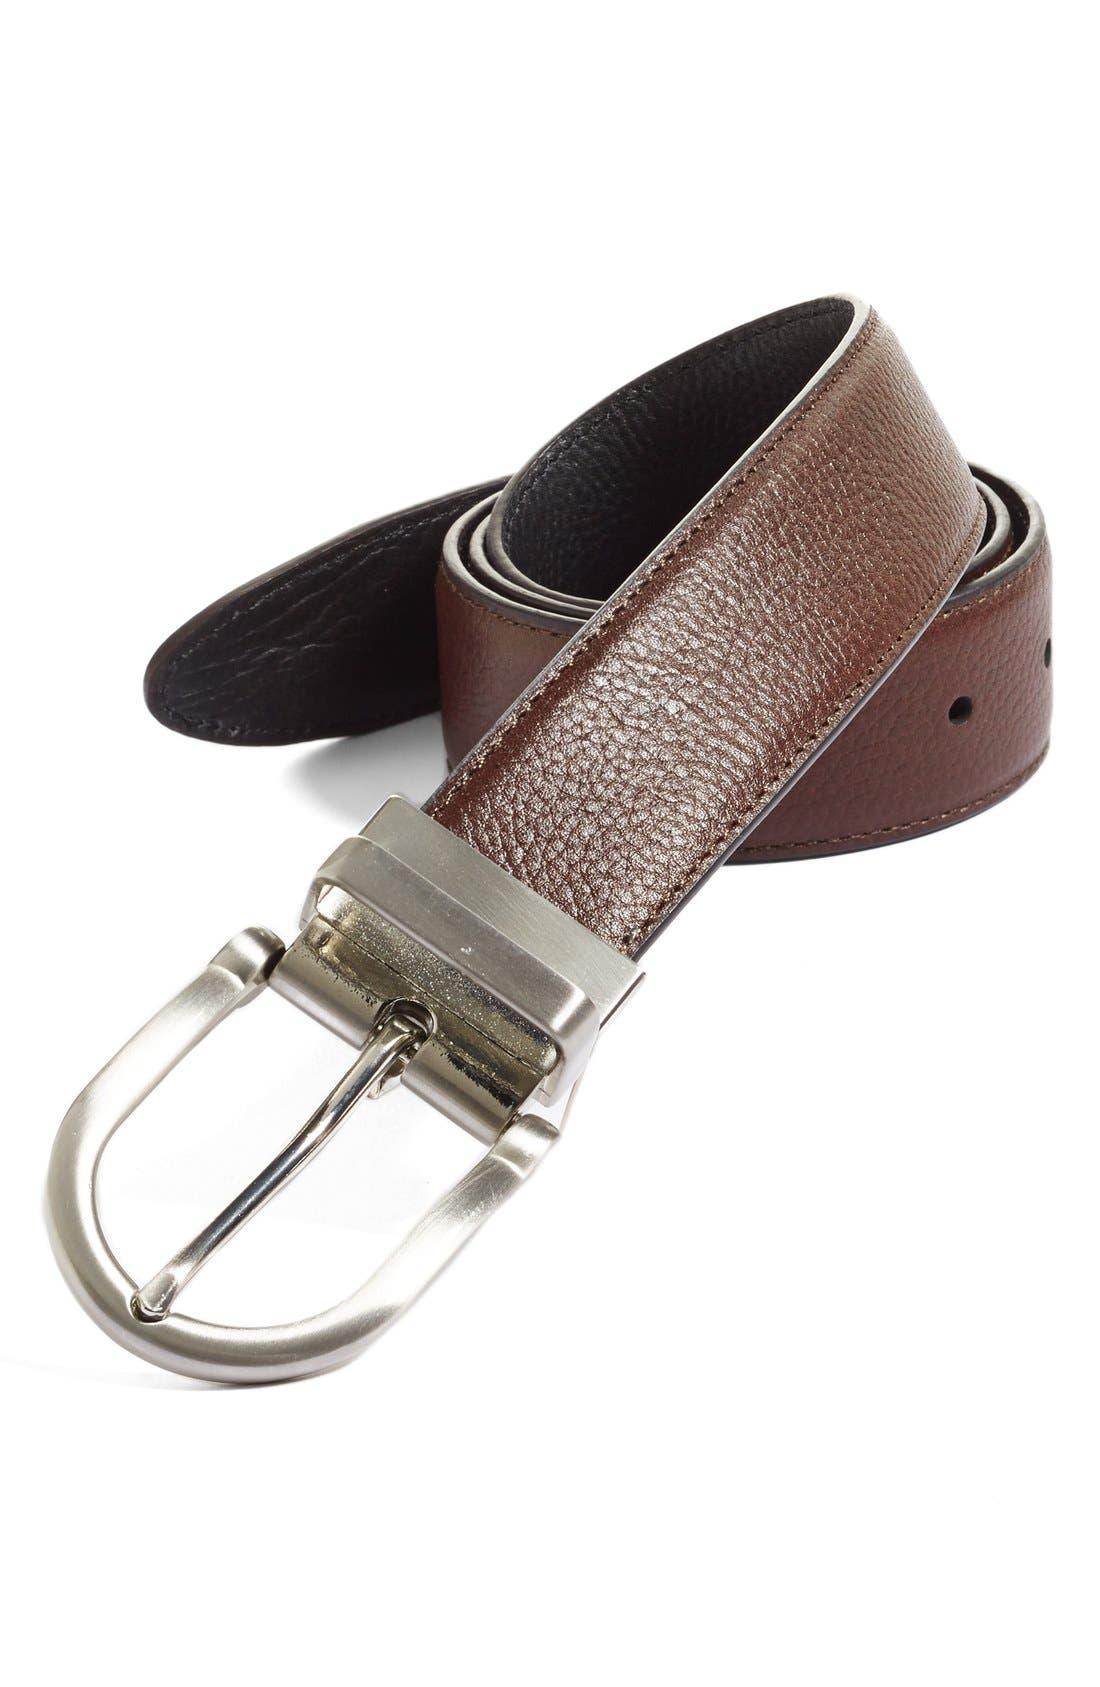 Alternate Image 1 Selected - Nordstrom Reversible Leather Belt